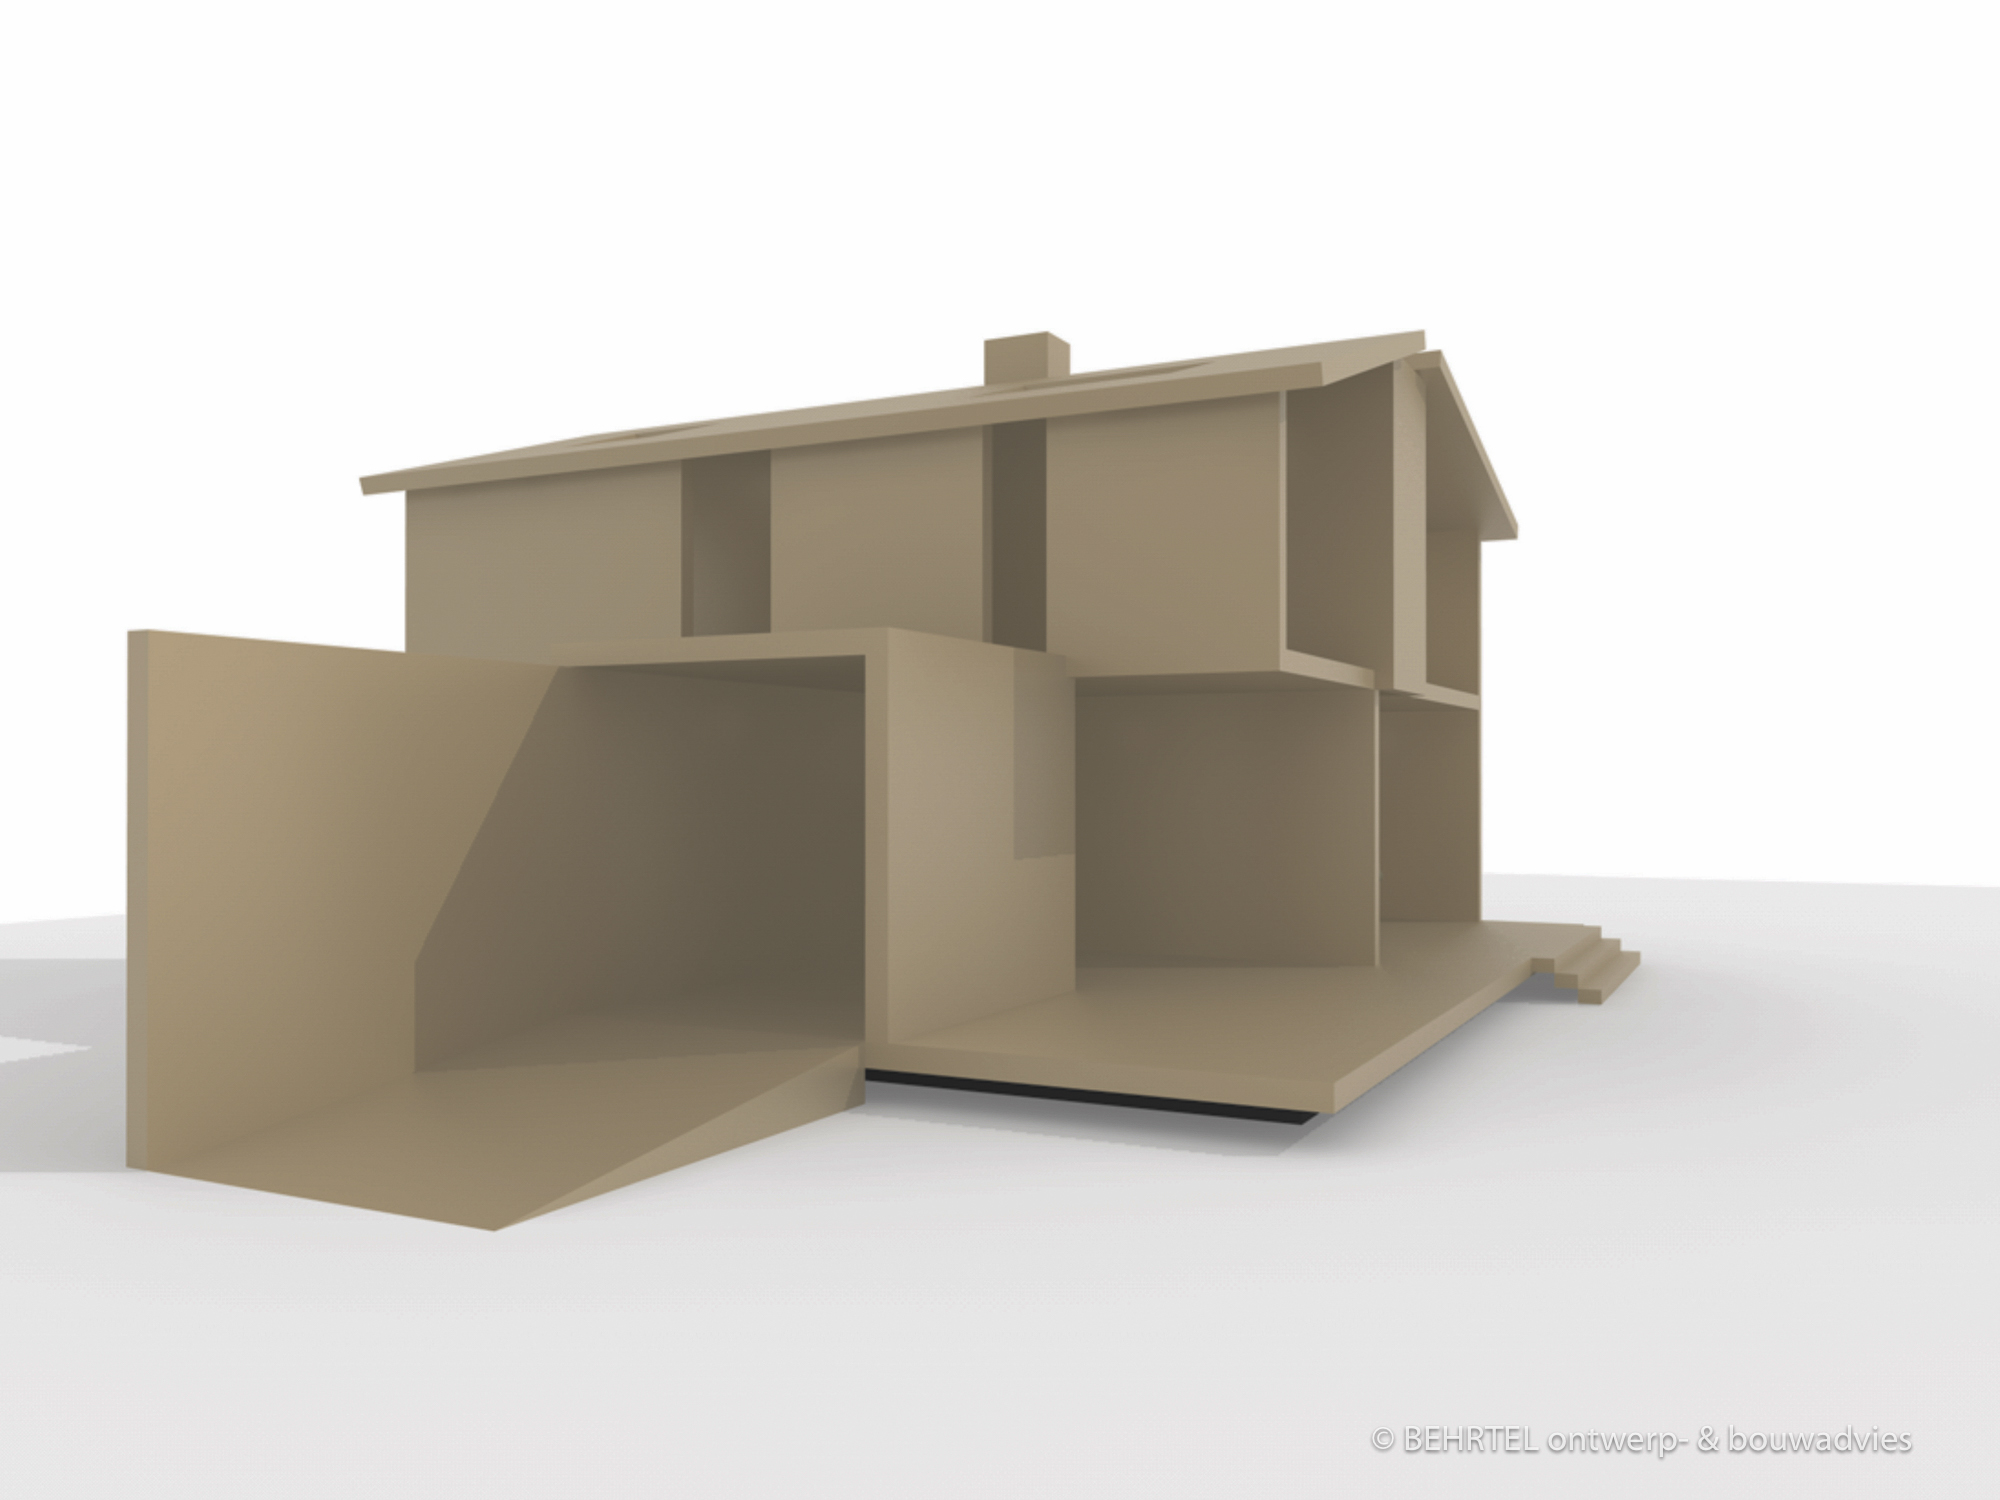 p15-004-poppenhuis-3d-1